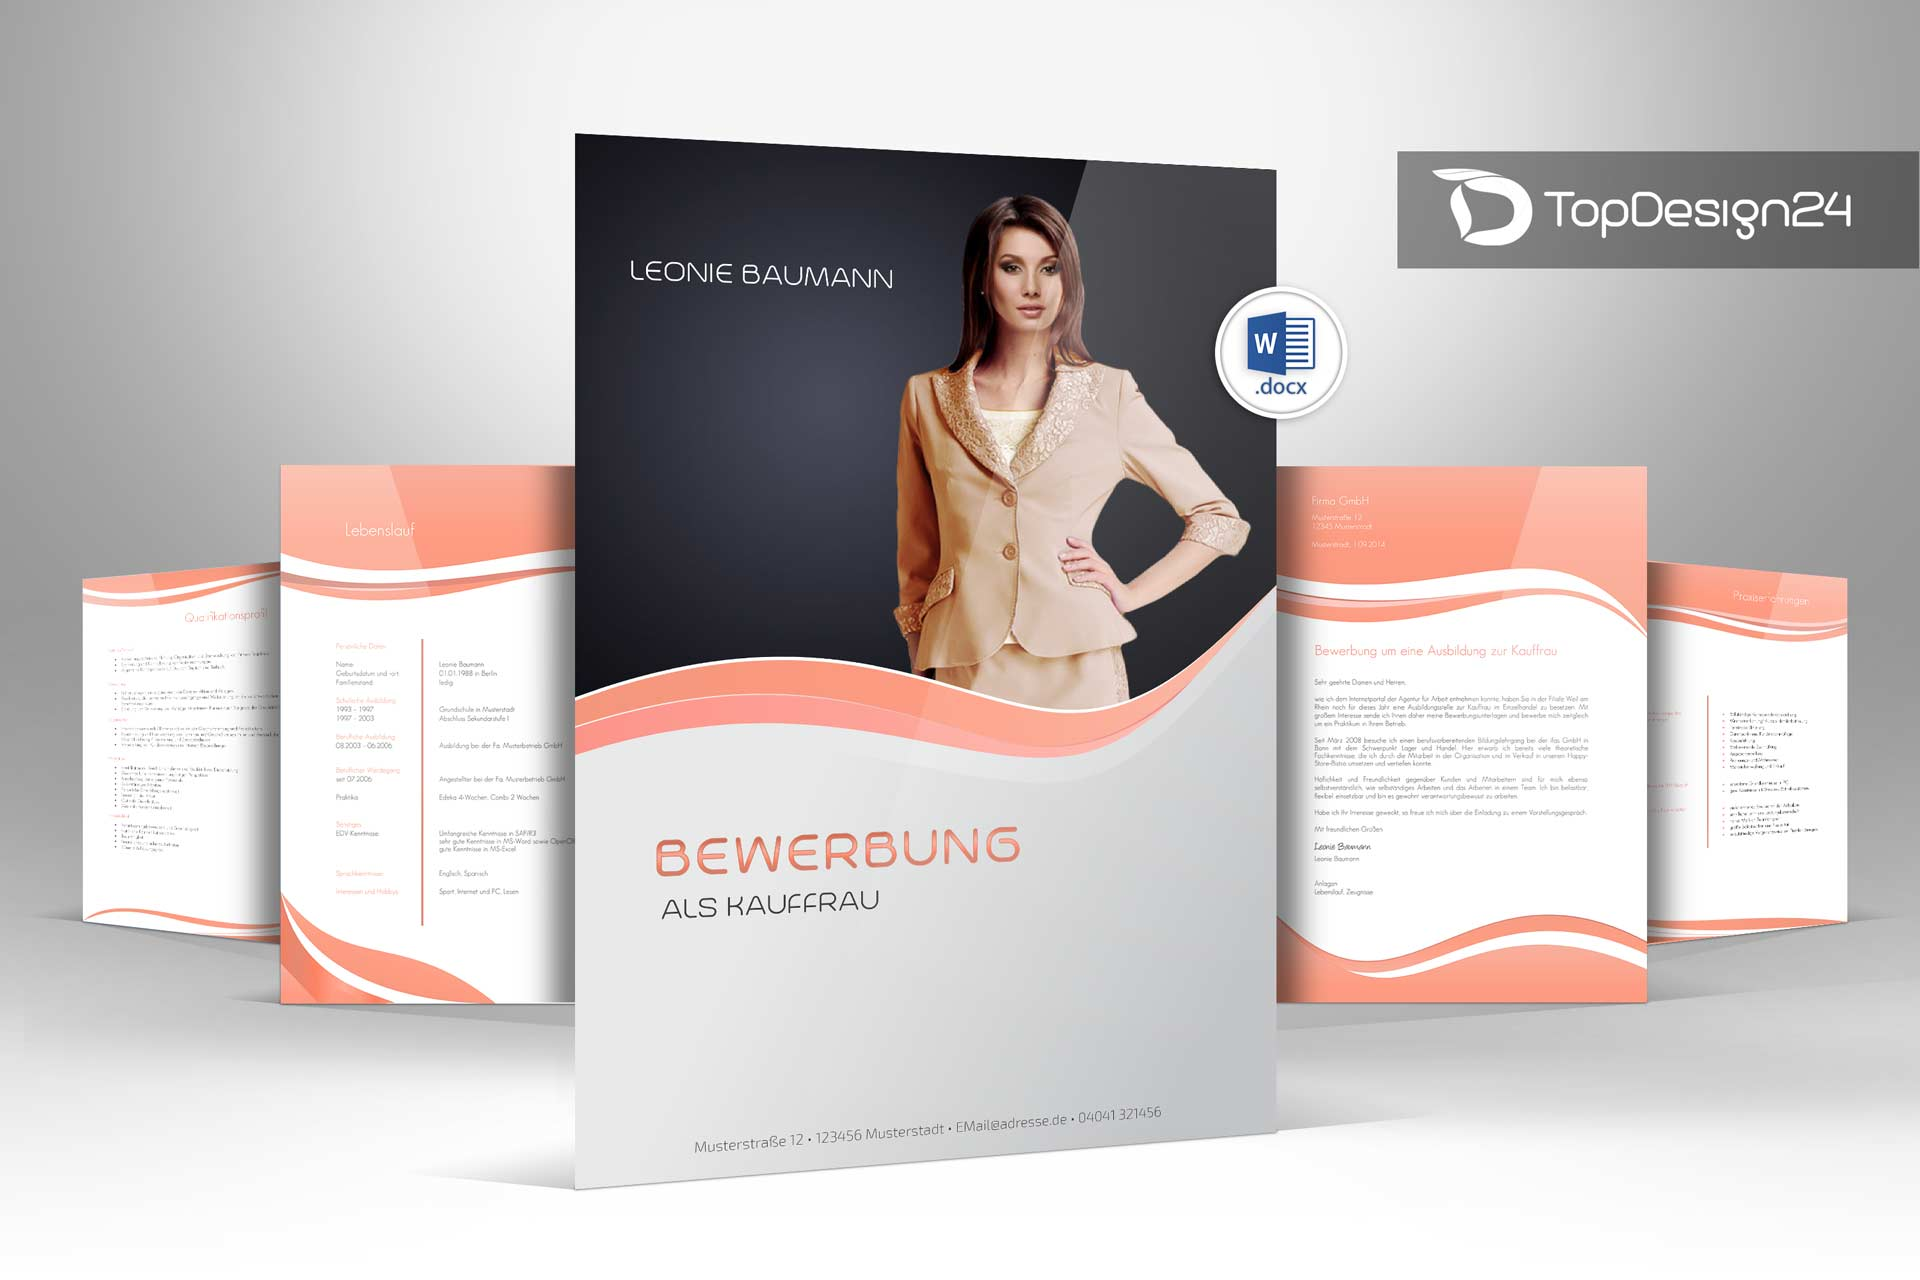 bewerbung muster download - Bewerbung Muster Download